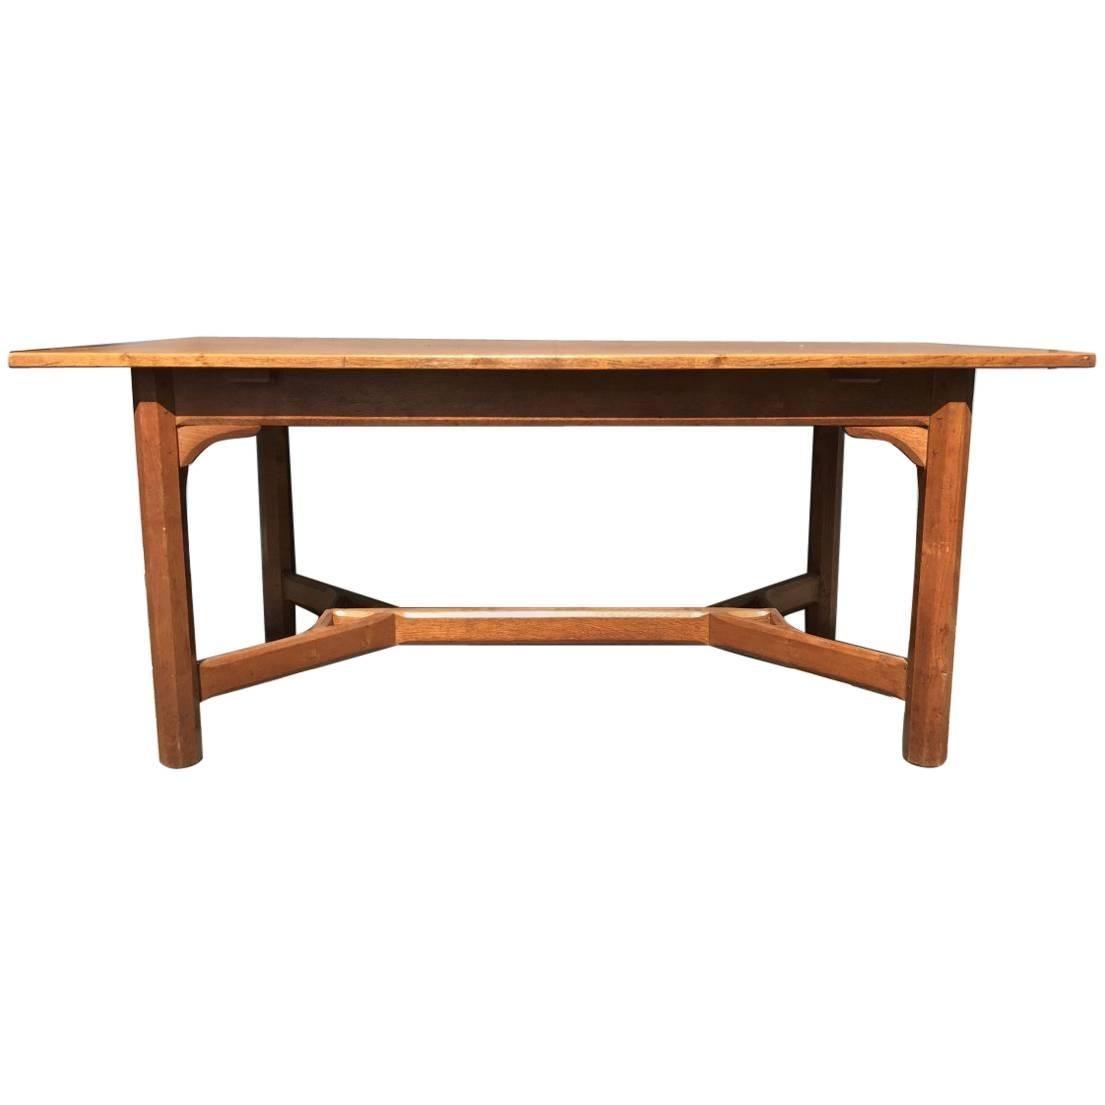 Gordon Russell, Arts & Crafts Cotswold School Oak Hayrake Stretcher Dining Table